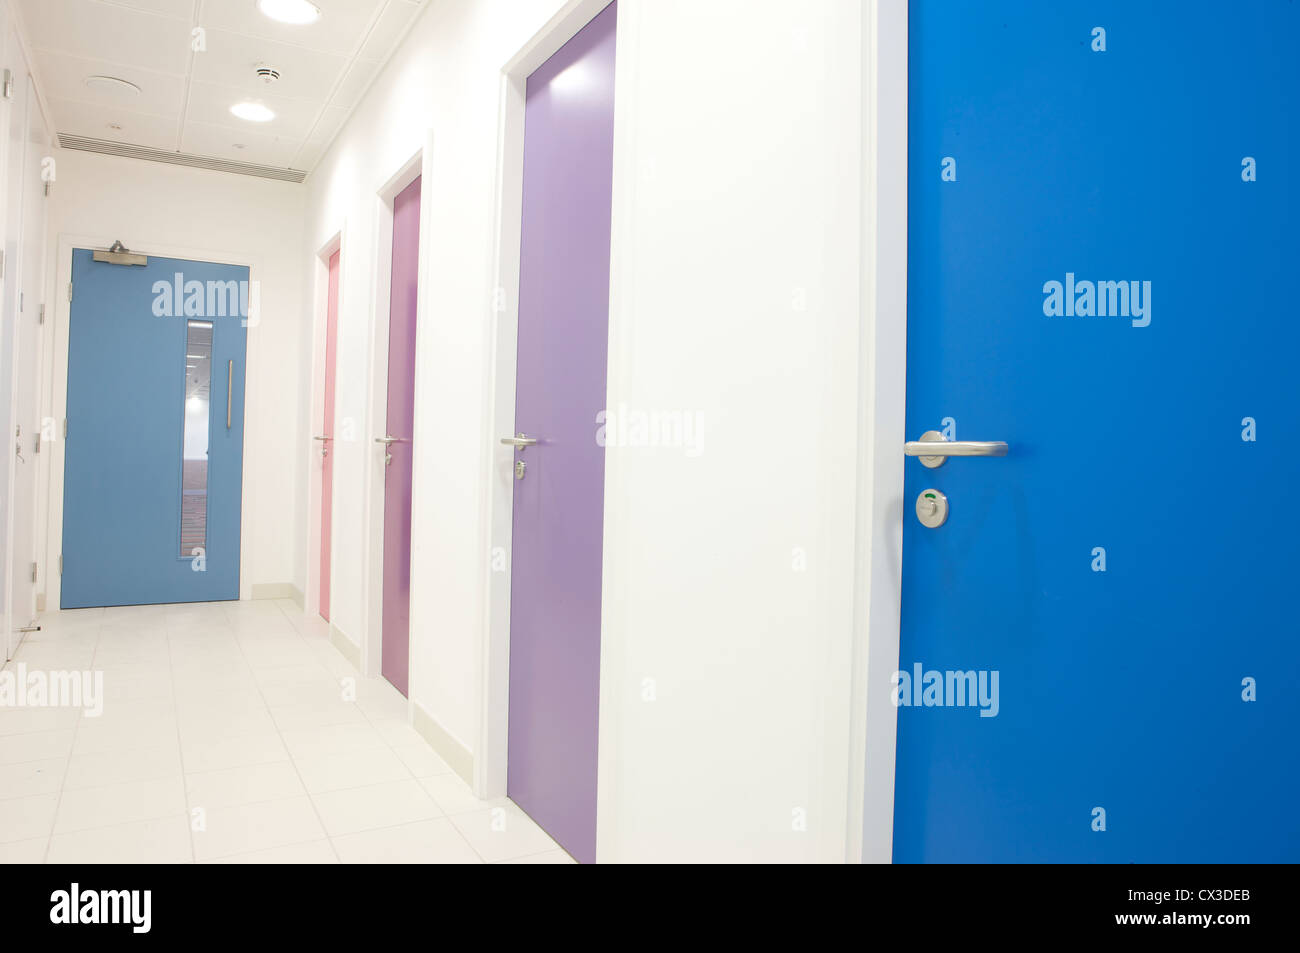 Moderne Büro-Innenarchitektur. Blau, rosa und lila Türen Stockfoto ...